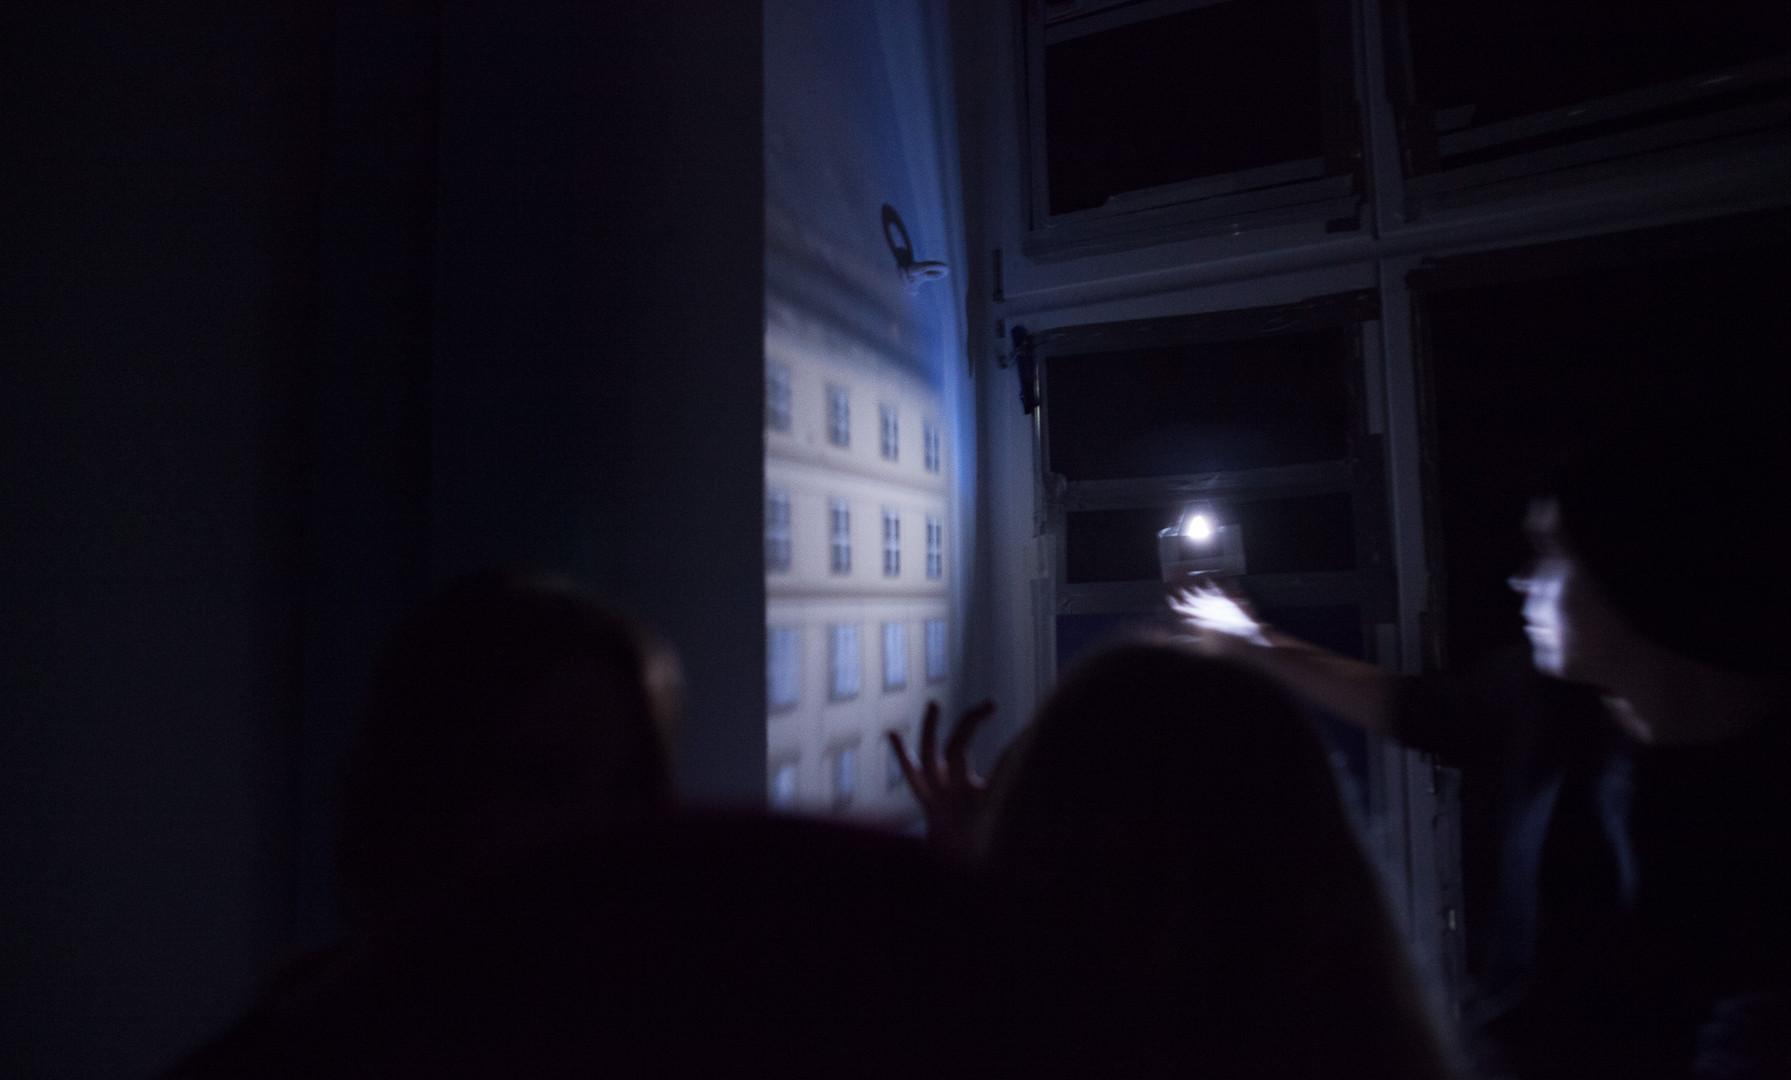 we are in the pinhole camera , camera obscura .